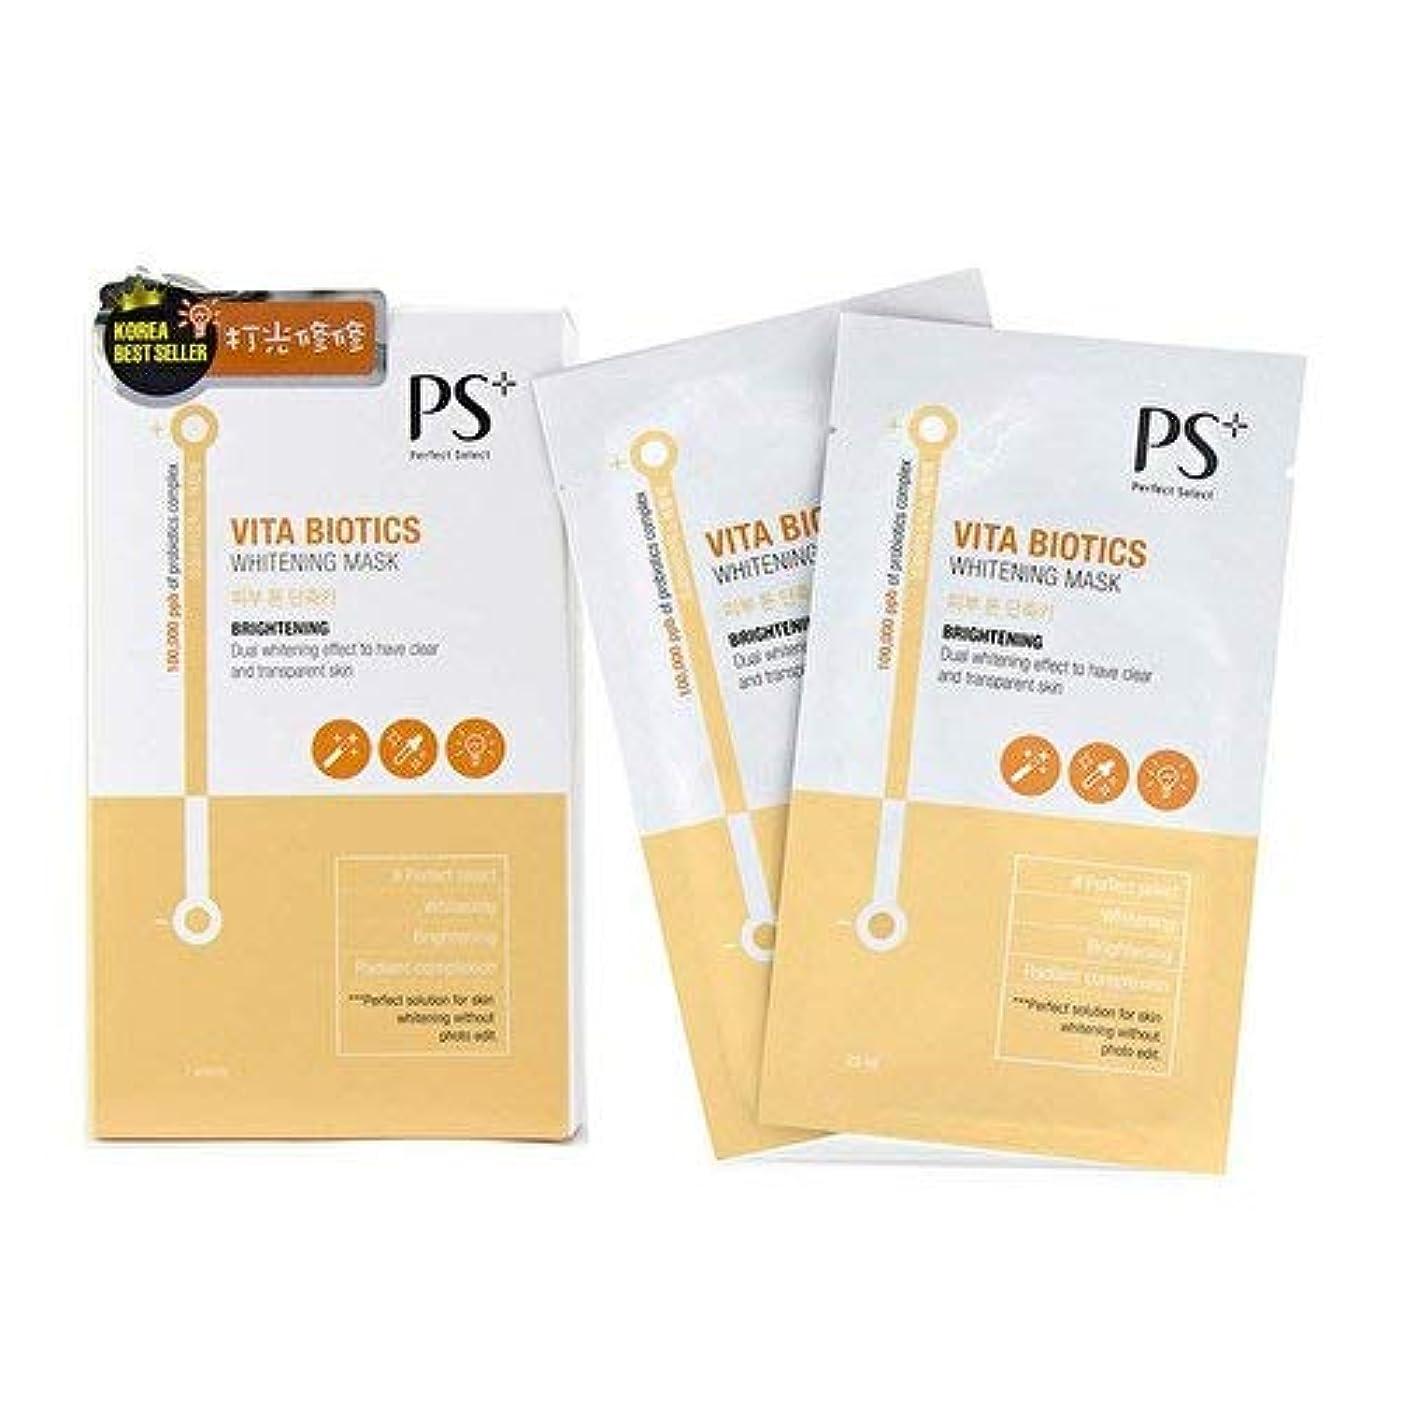 効率前部分的PS Perfect Select Vita Biotics Whitening Mask - Brightening 7pcs並行輸入品